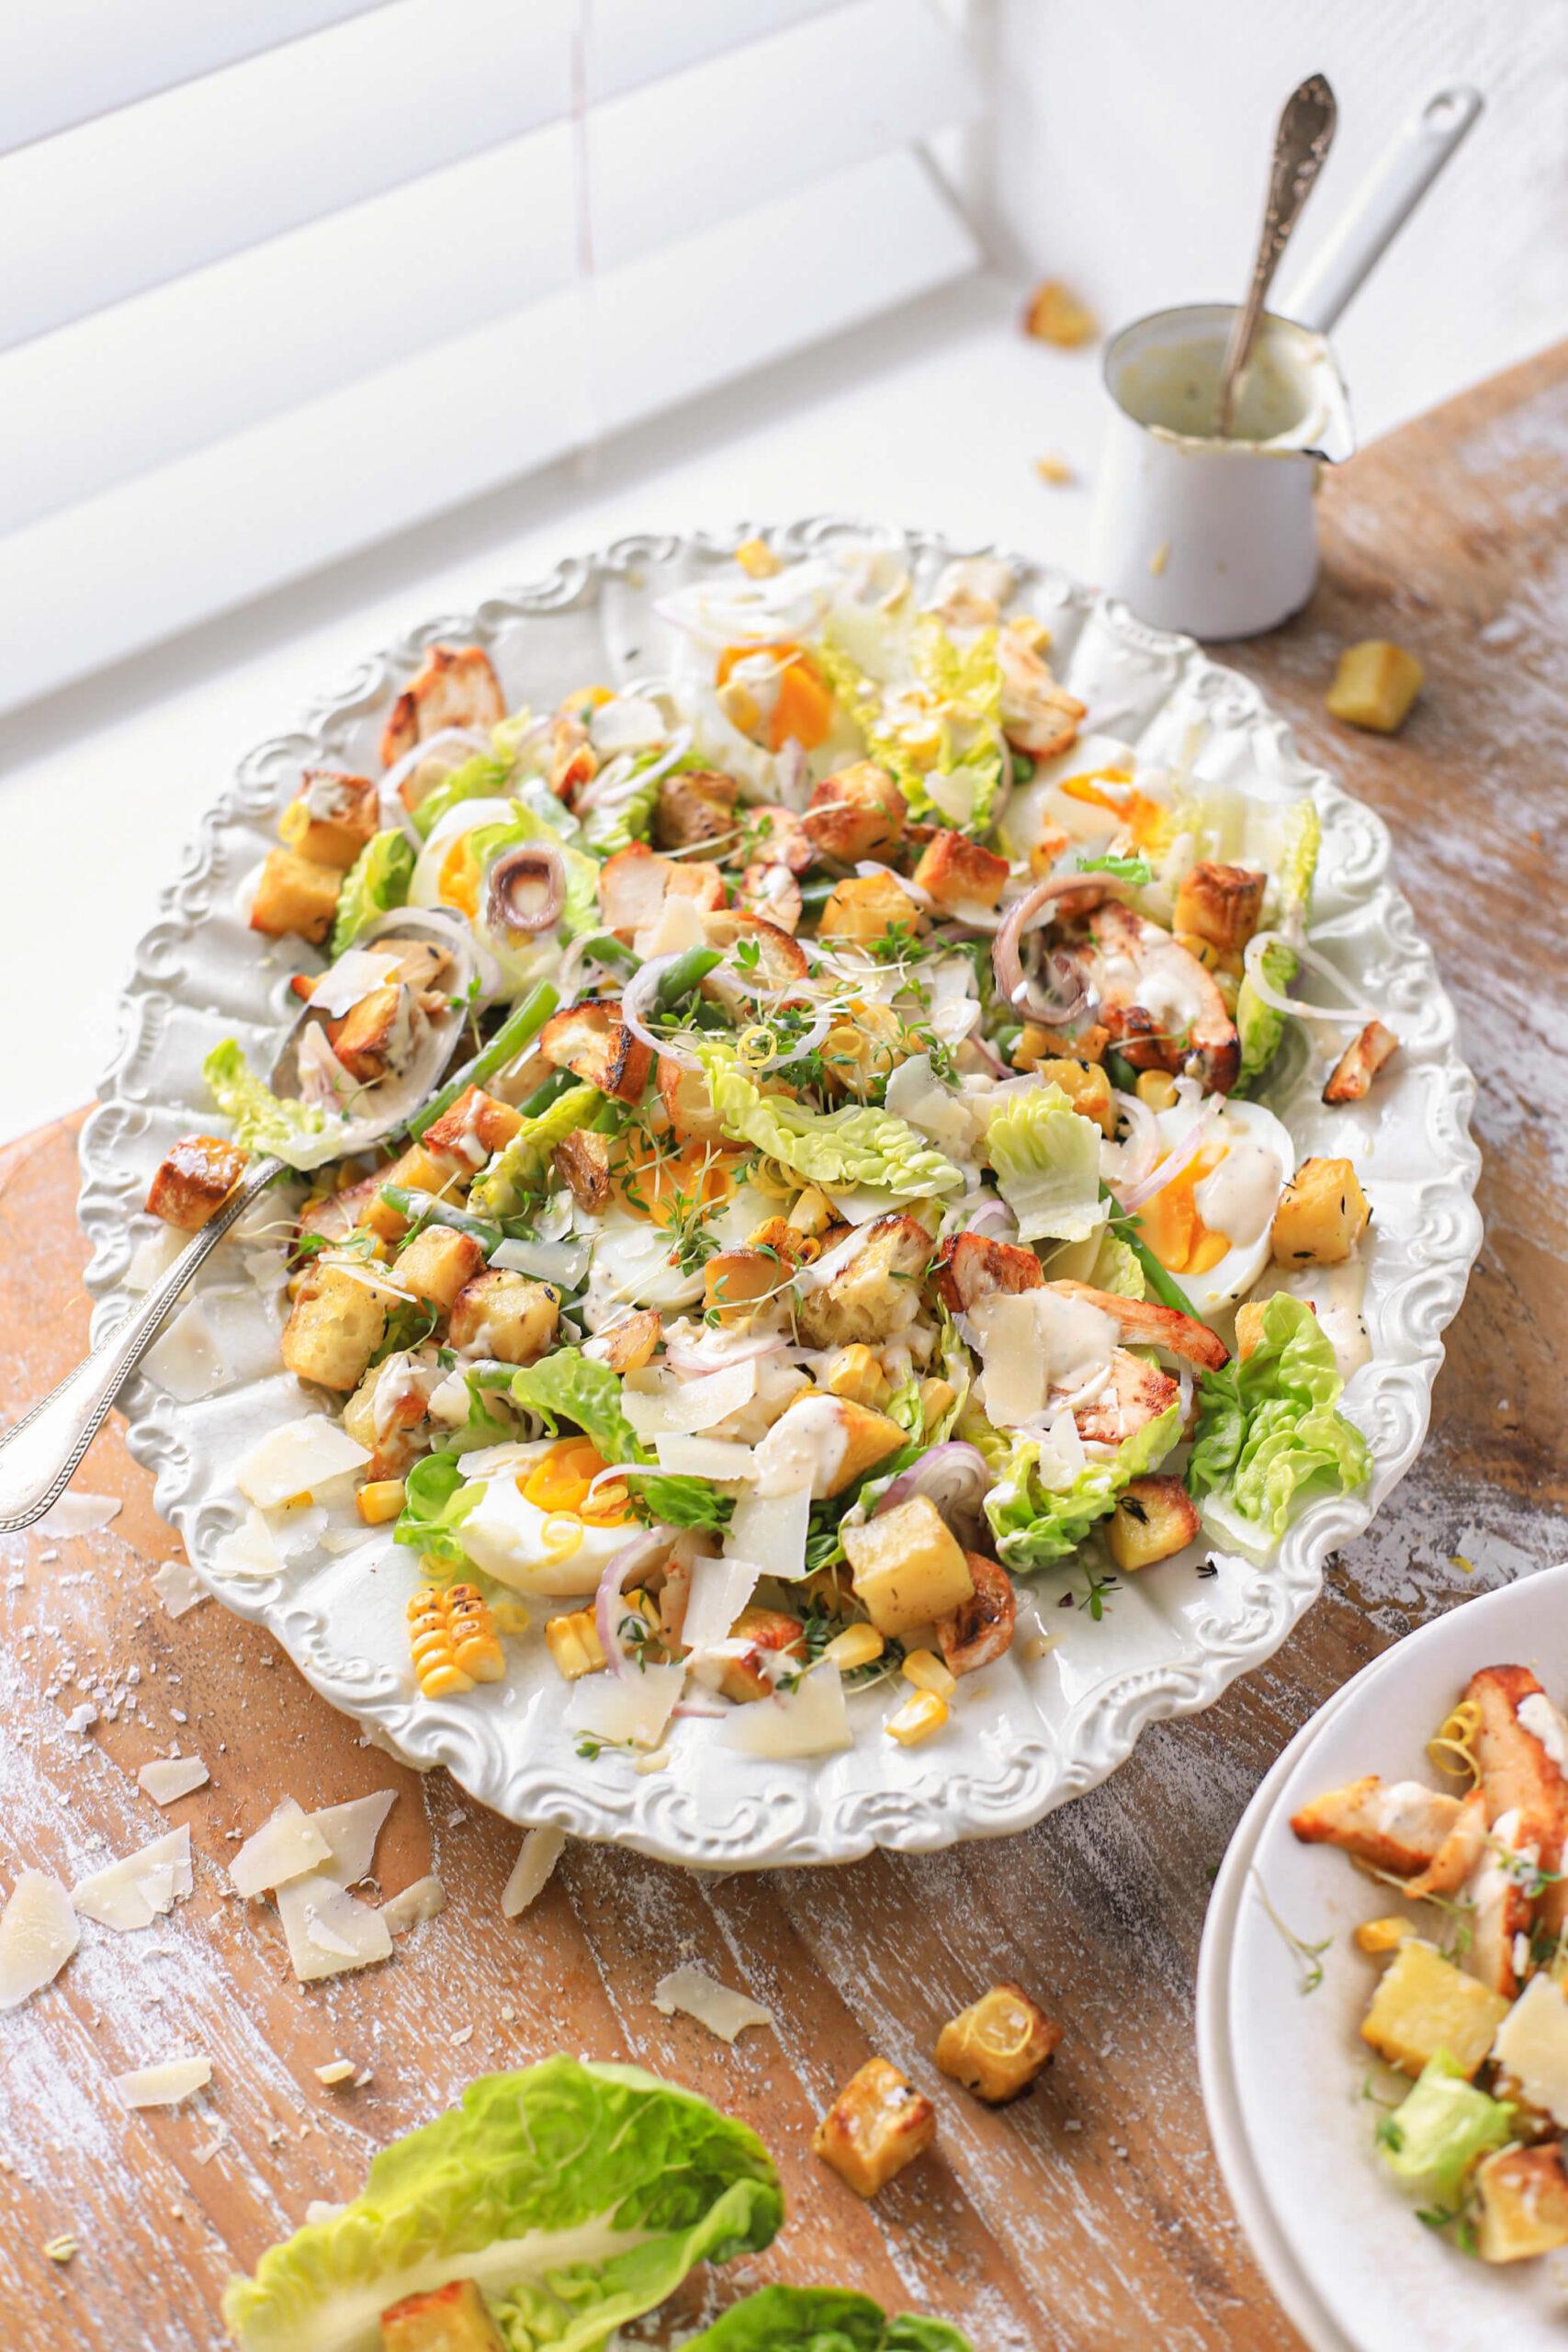 Caesar salade met ansjovis